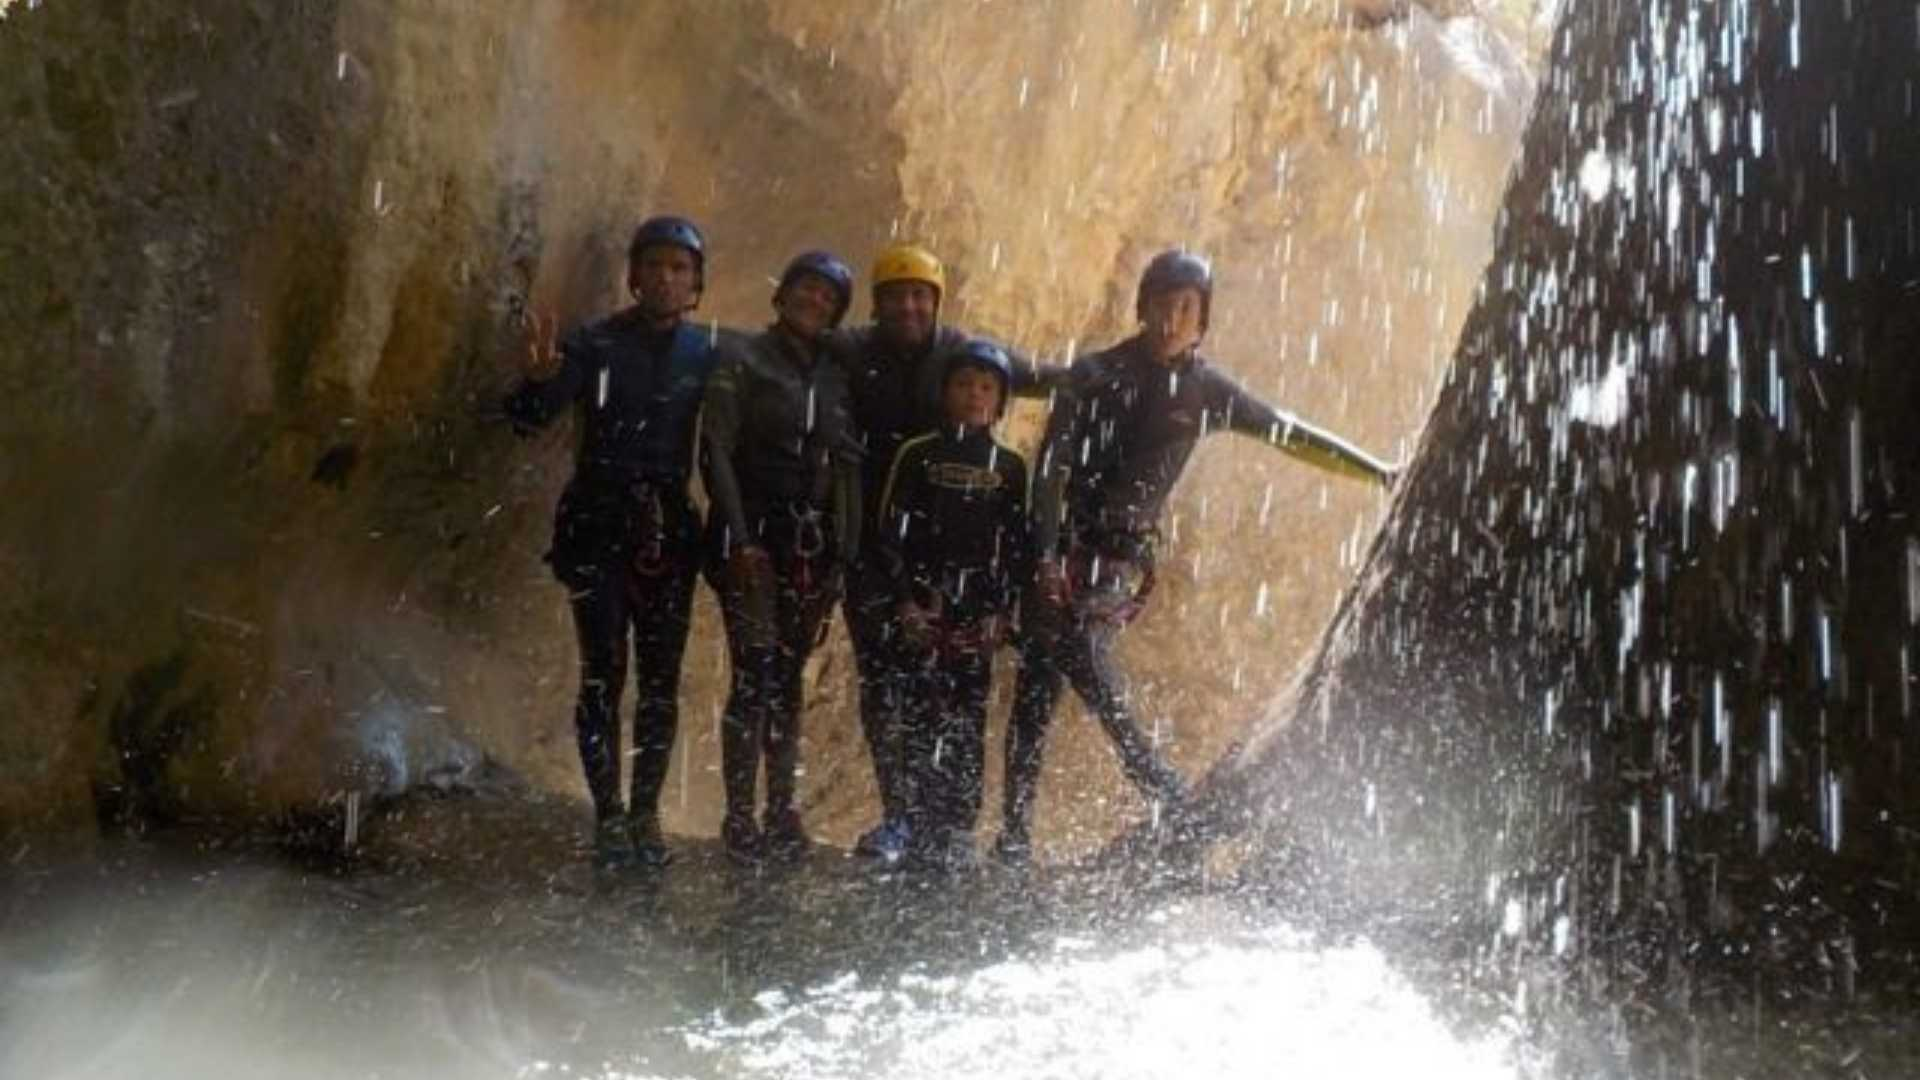 Hundertjährige Wasserschlucht